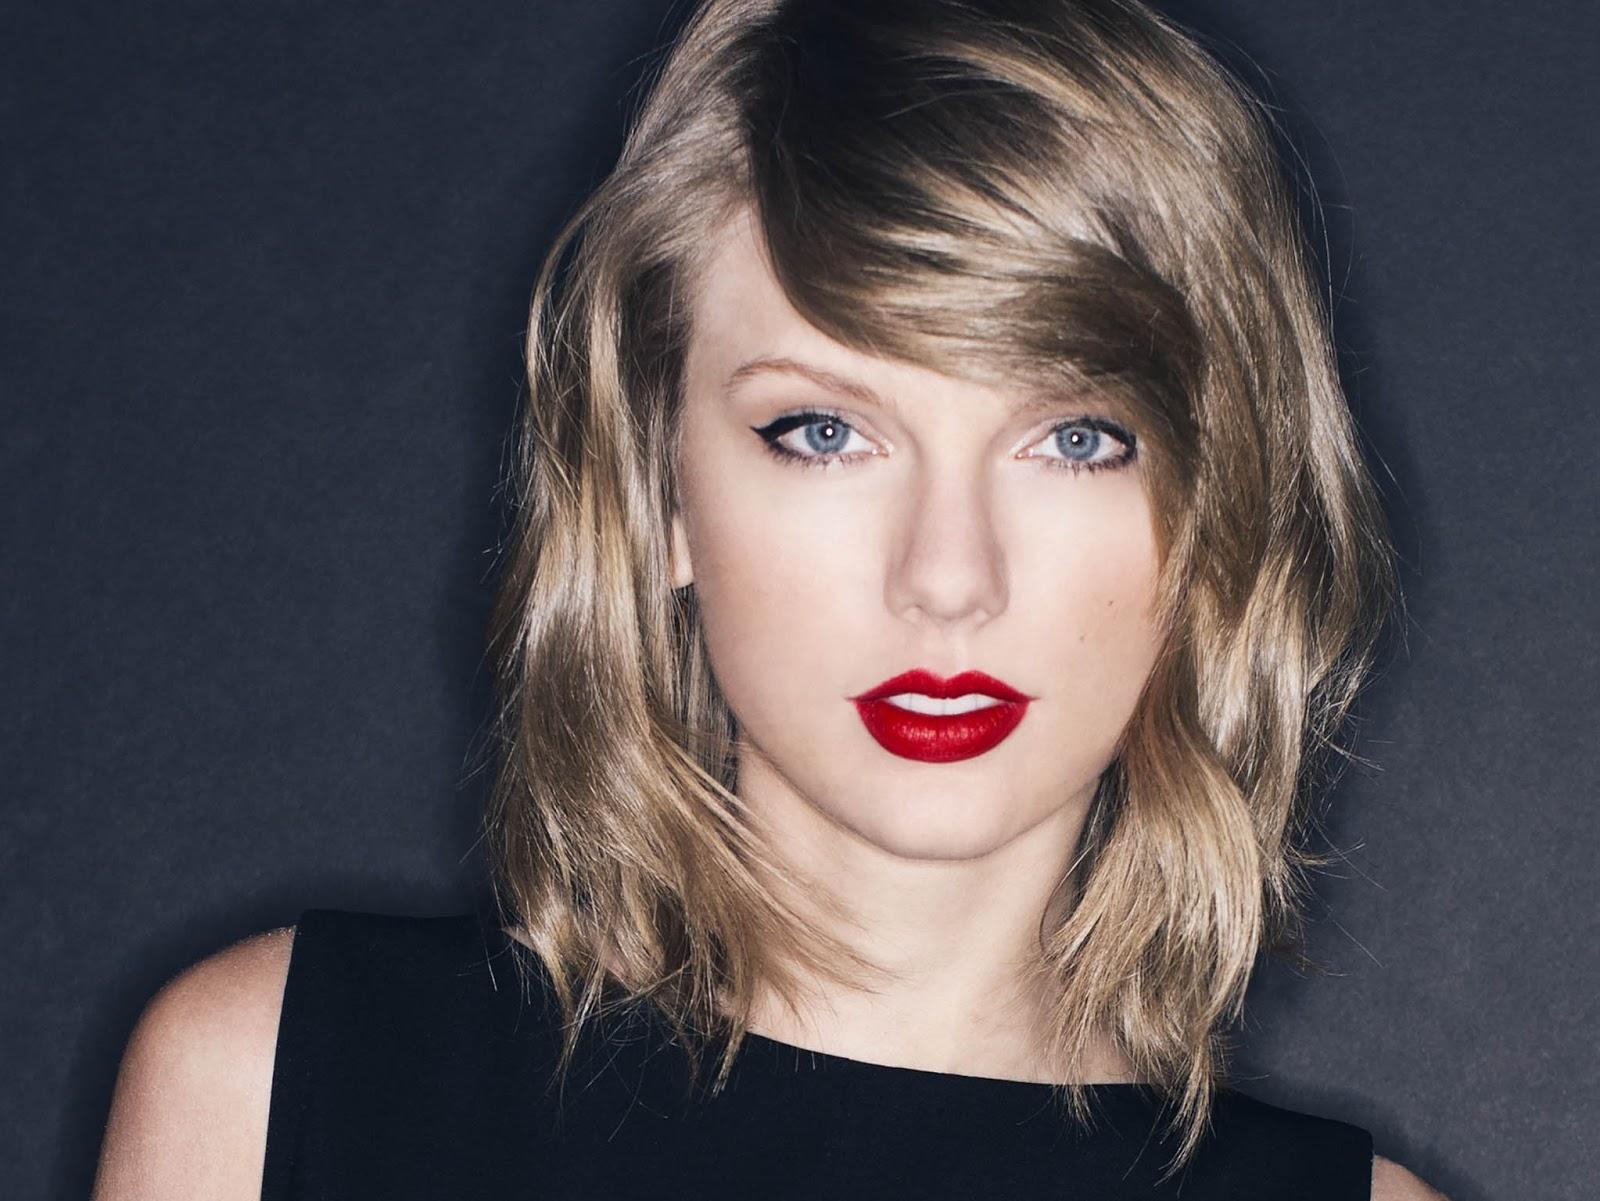 Kunci Gitar Dasar Fearless Taylor Swift Gudang Inspirasiceeboong